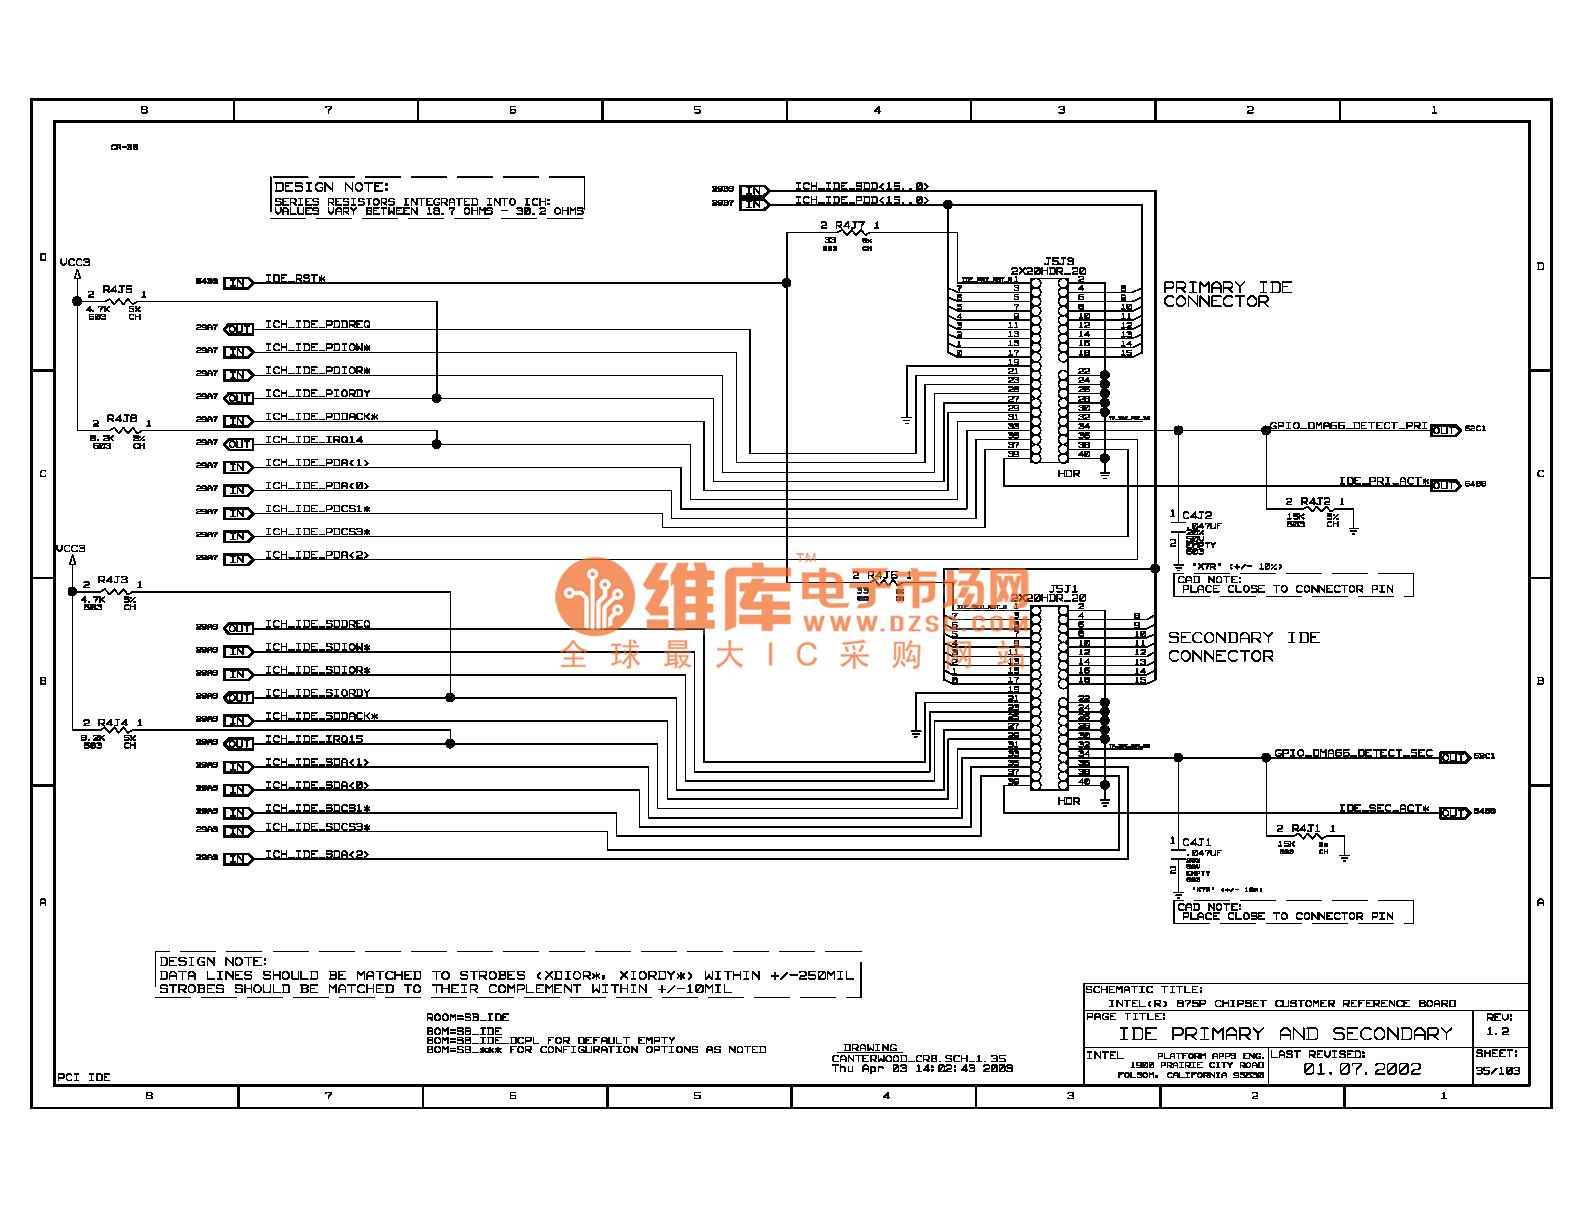 875p computer motherboard circuit diagram 039 - computer-related circuit